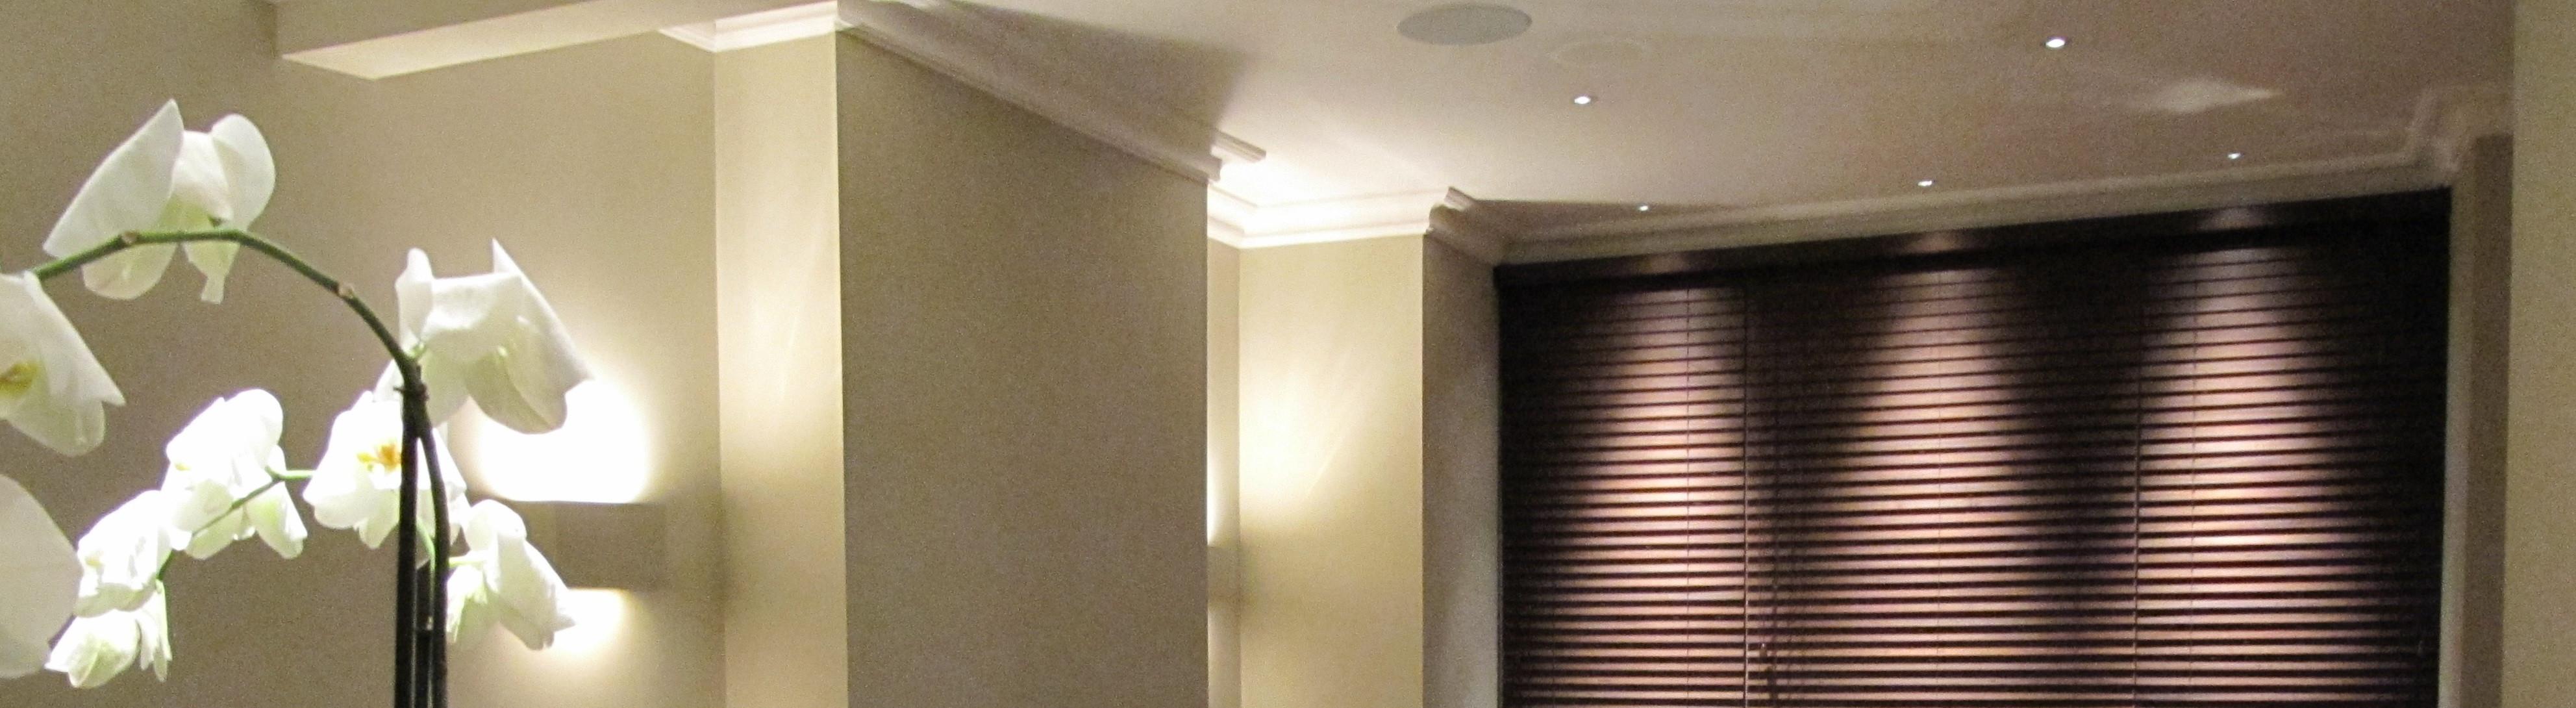 Wall Lights & Downlights